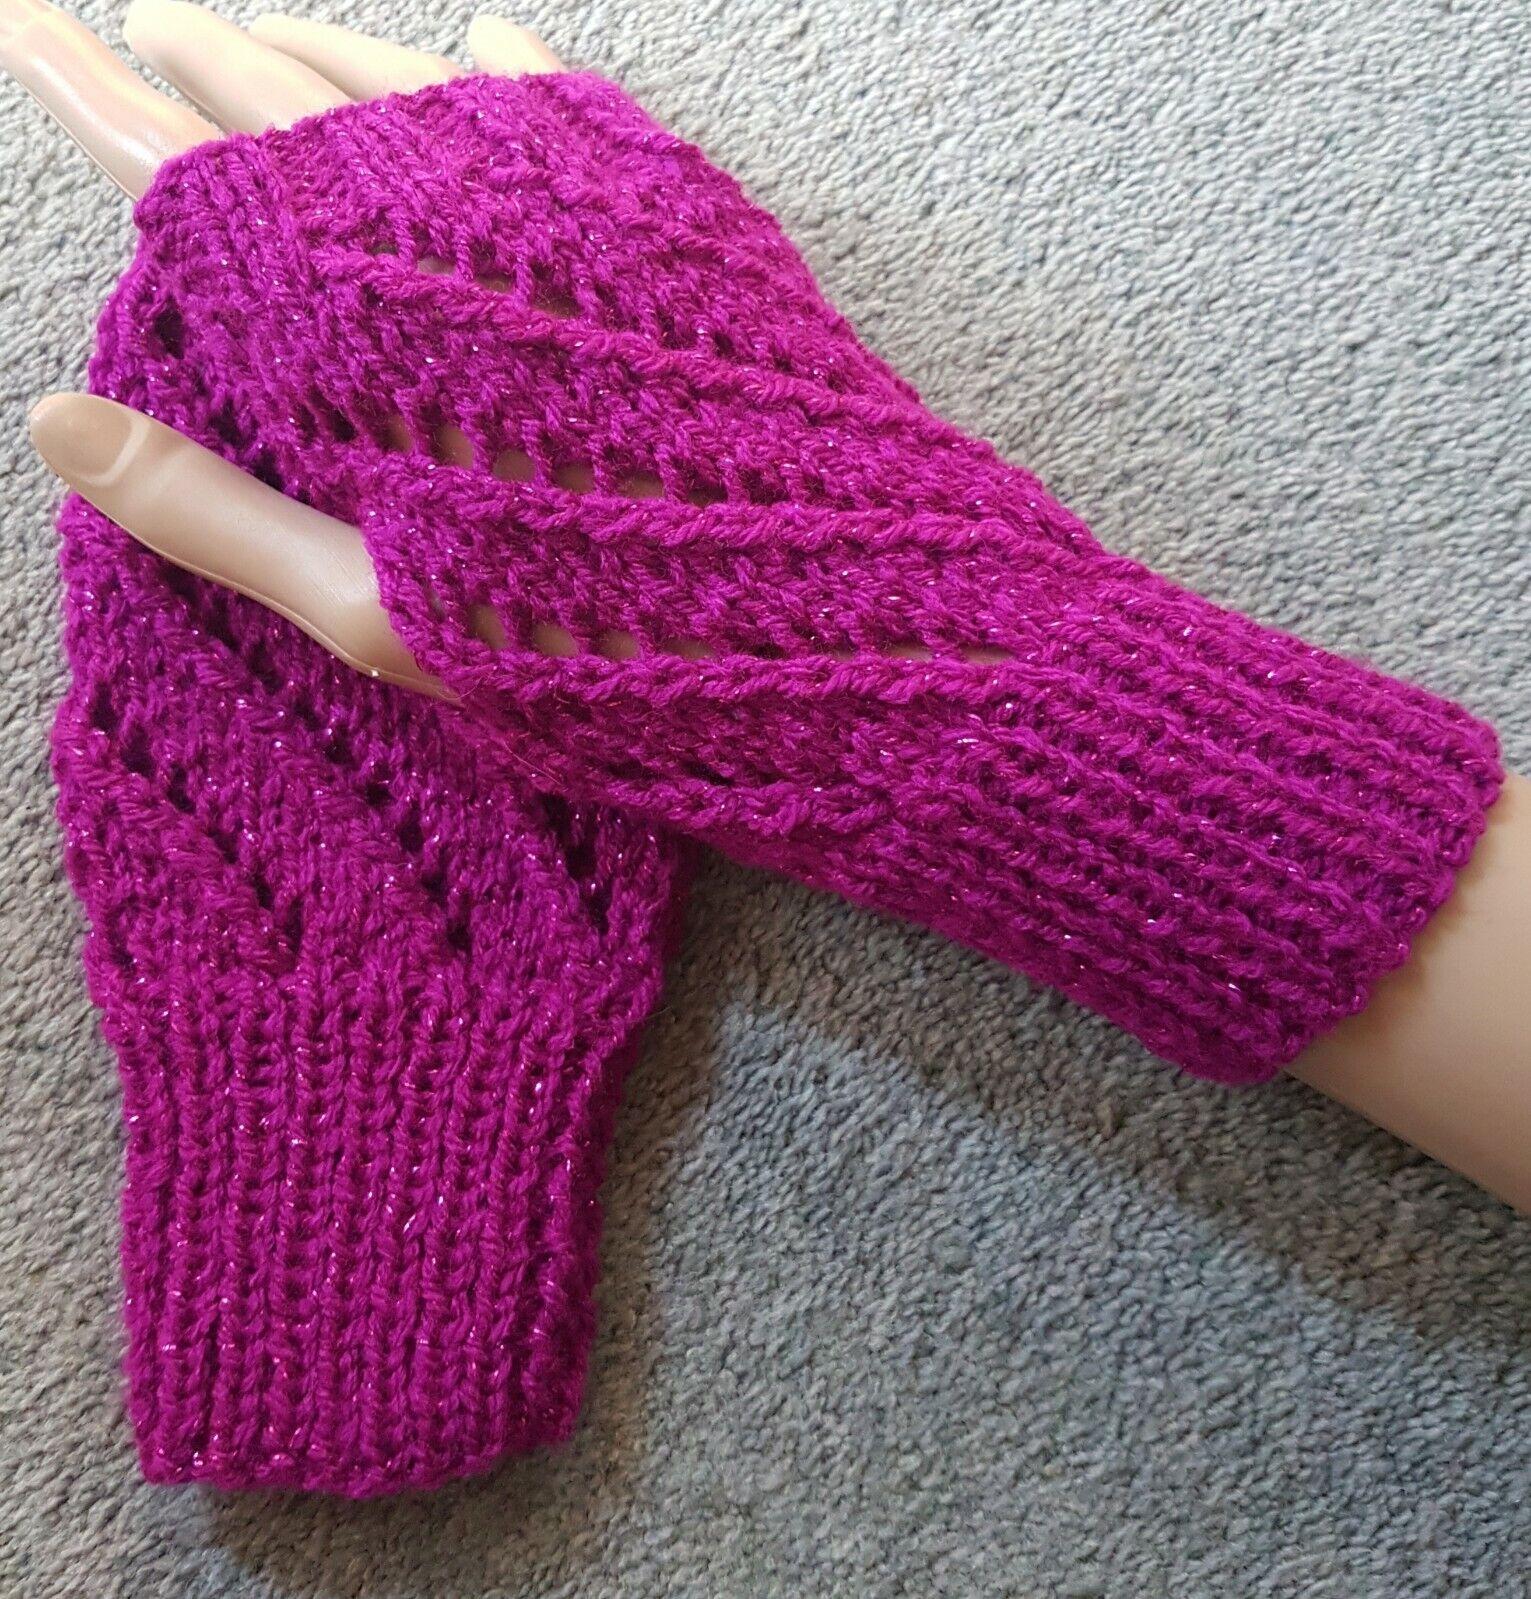 Hand Knitted Lace Effect Fingerless Gloves/Wrist Warmers: Pink & Glitter Thread